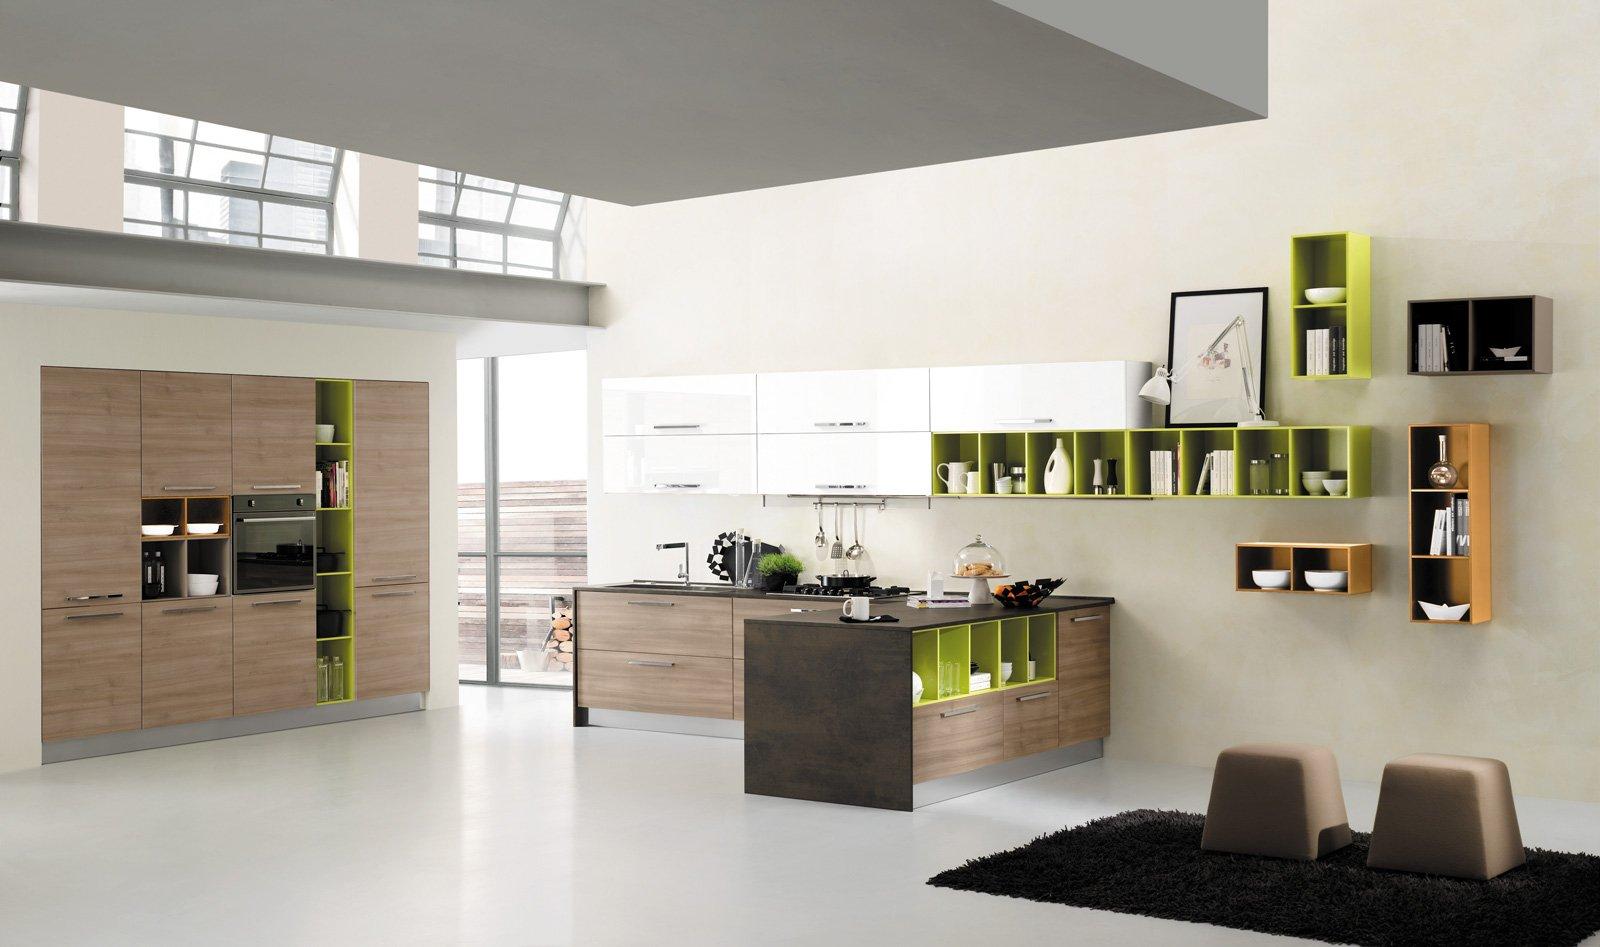 Pittura perlata per pareti - Pensili cucina prezzi ...